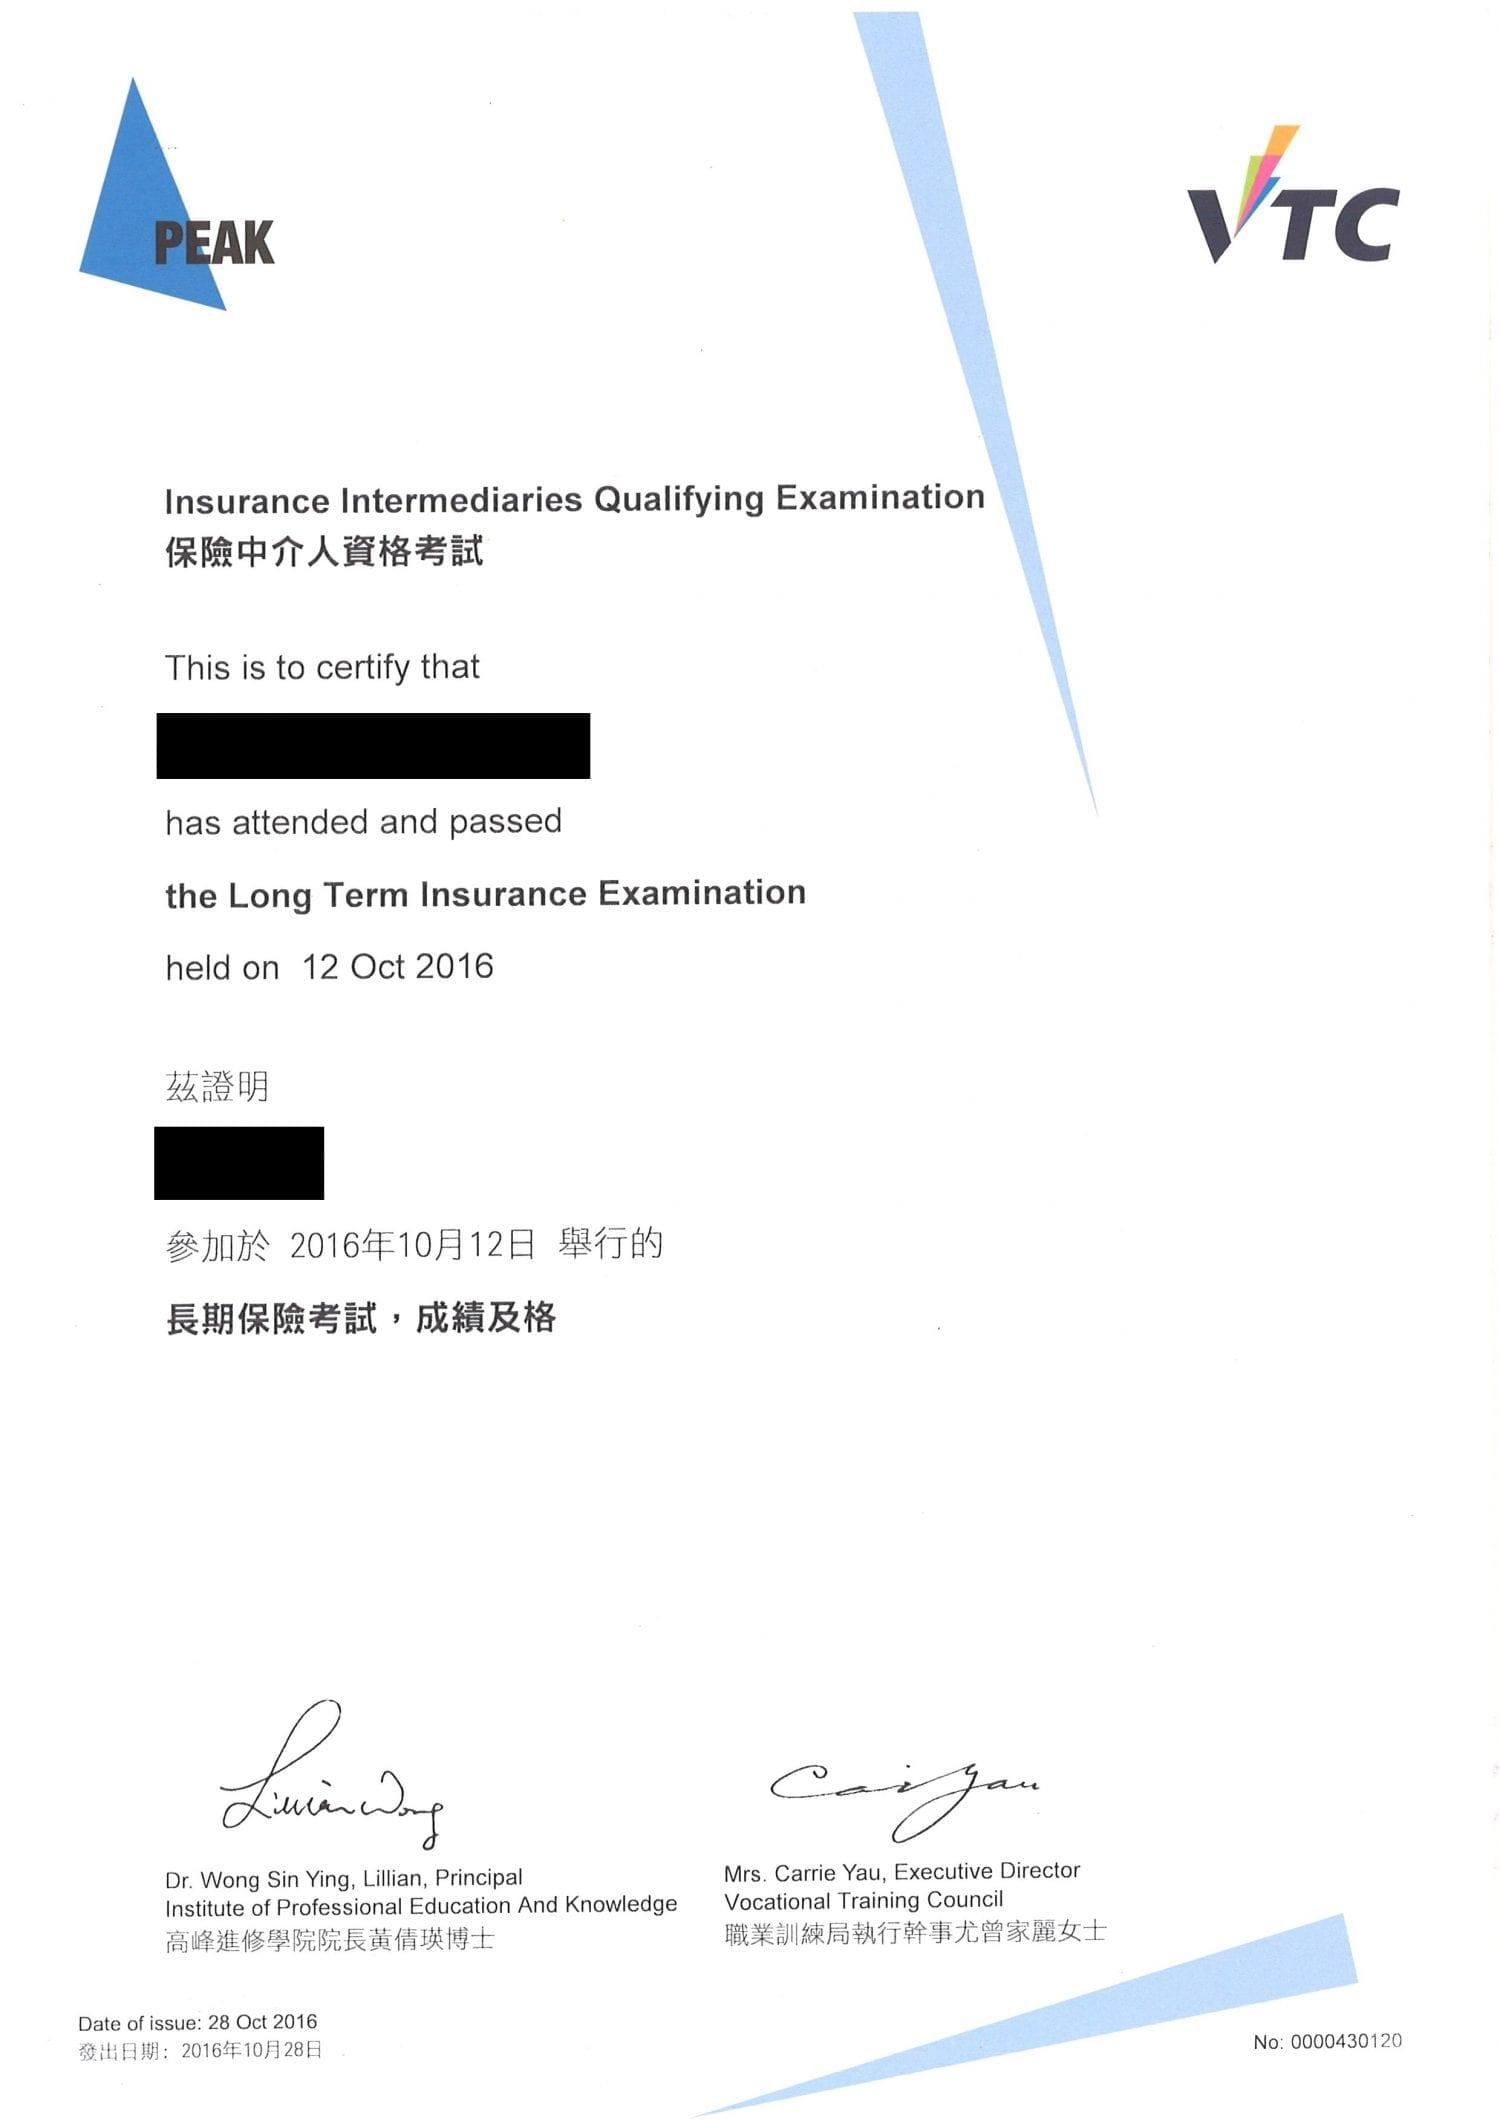 YCK 12/10/2016 IIQE Paper 3 保險中介人資格考試卷三 Pass